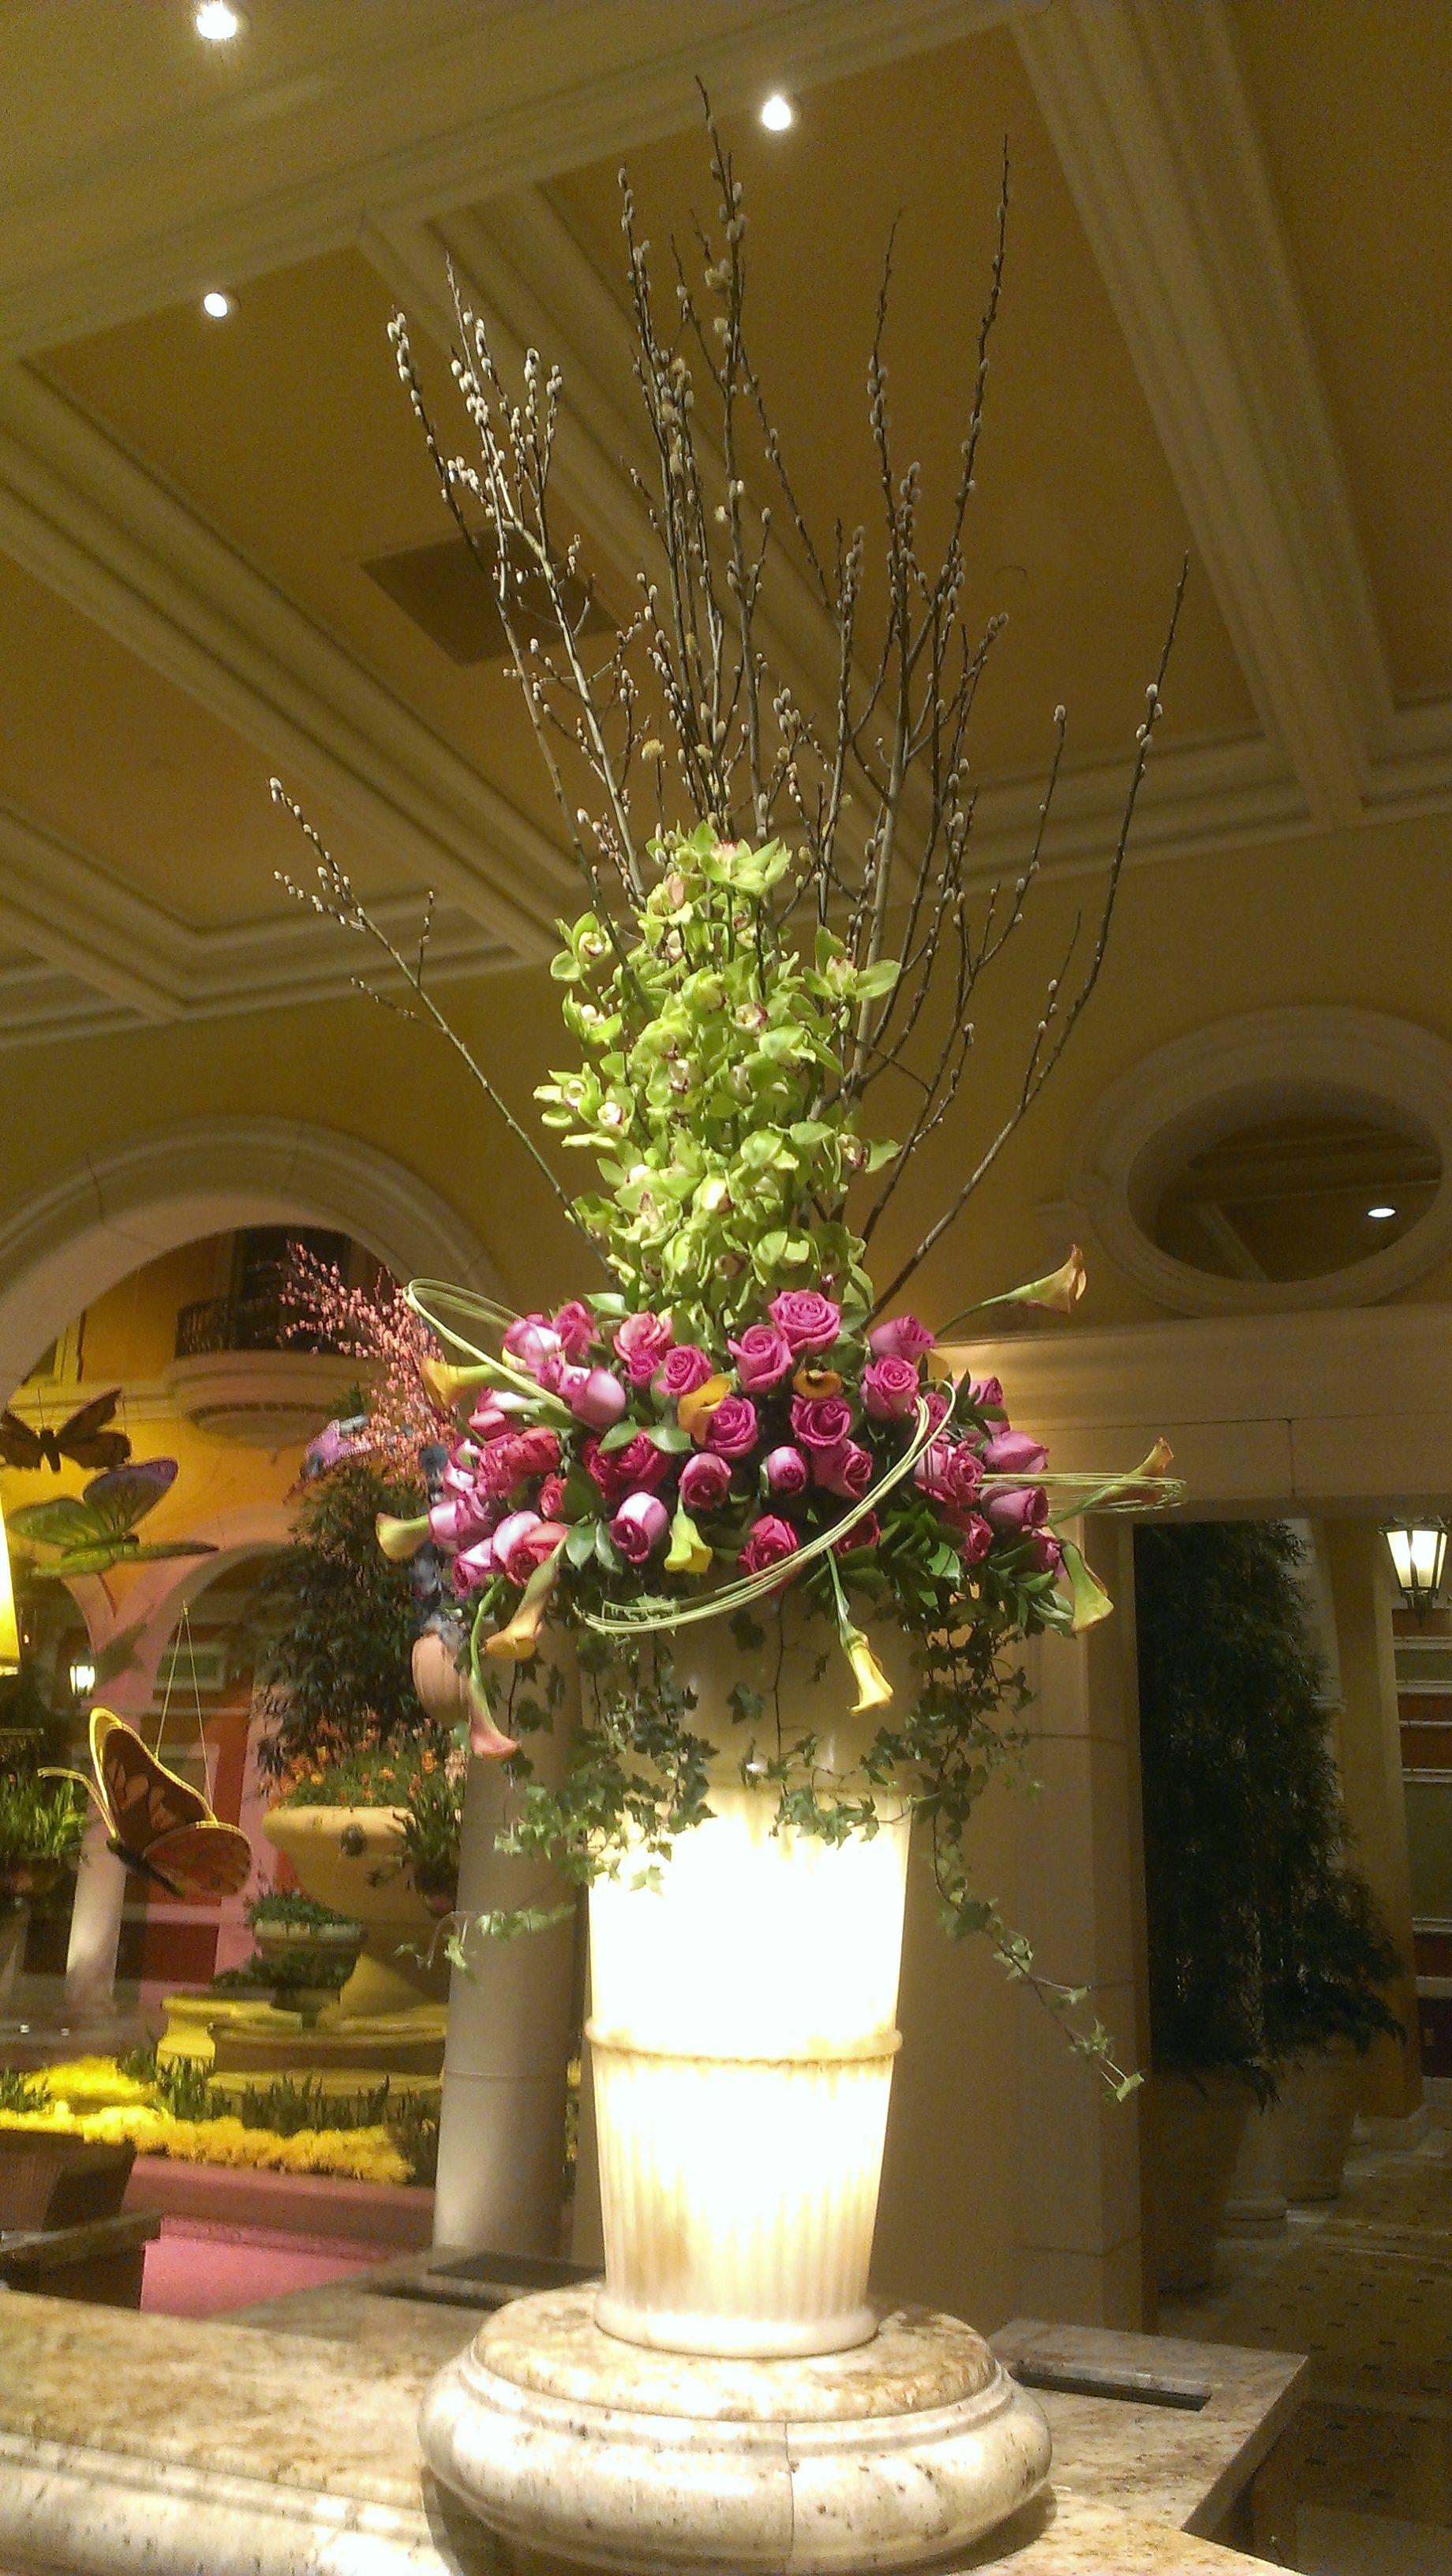 Hotel Foyer Flower Arrangements : Something that i secretly look forward to see every trip